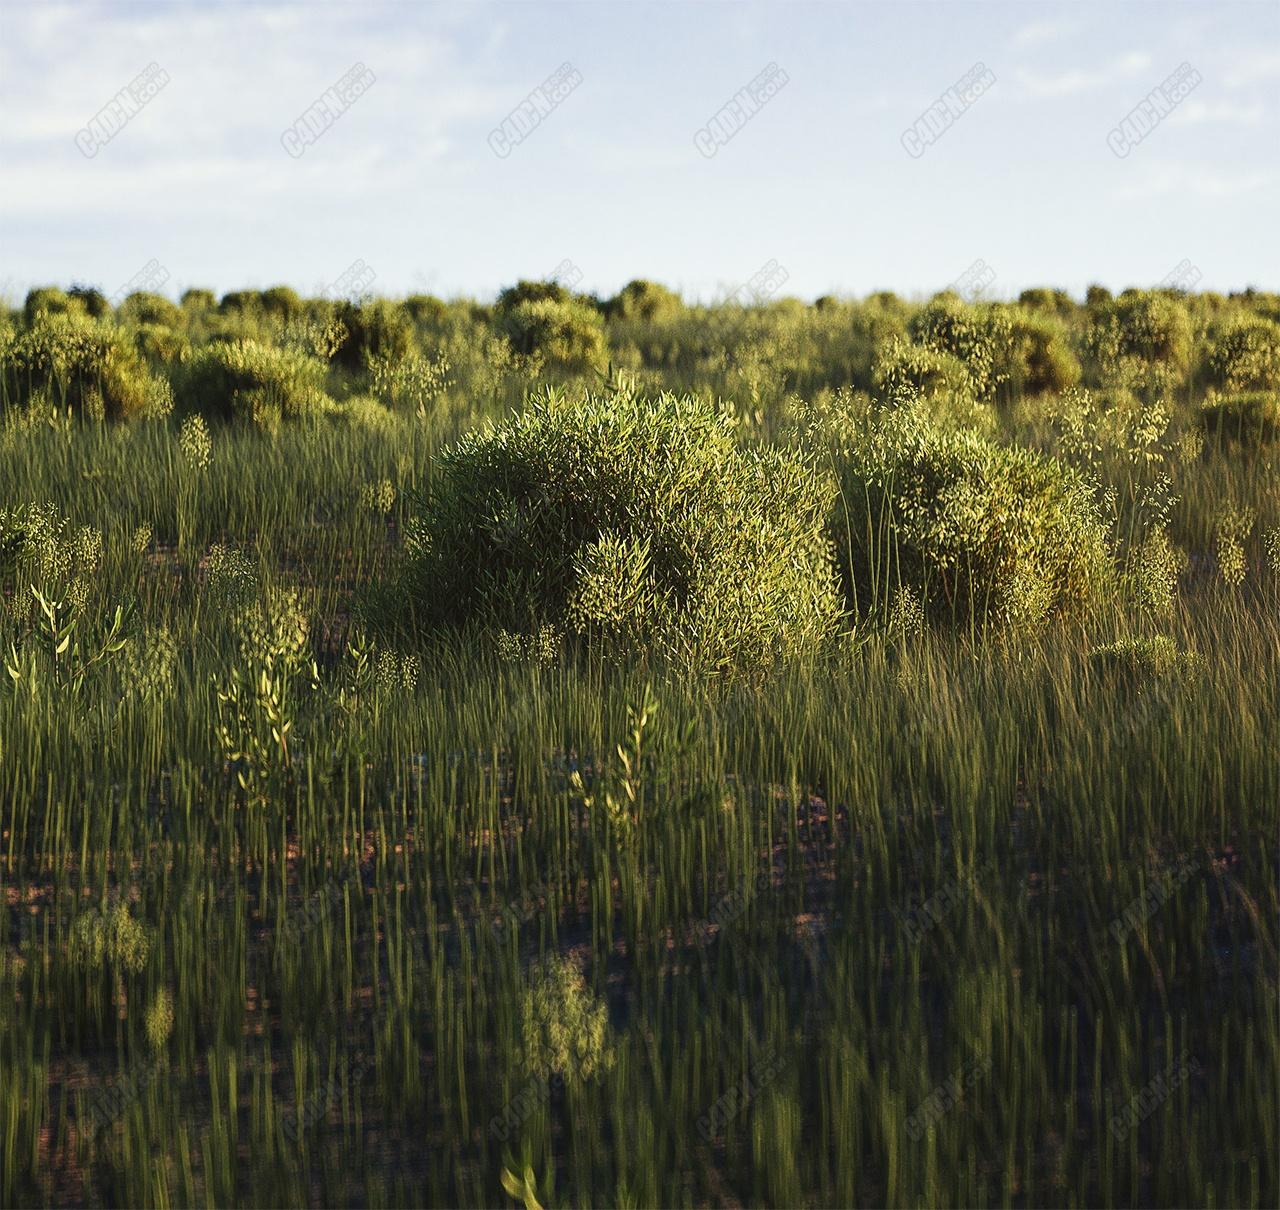 Octane渲染器C4D藍天白云灌木叢草地野外環境生態工程模型